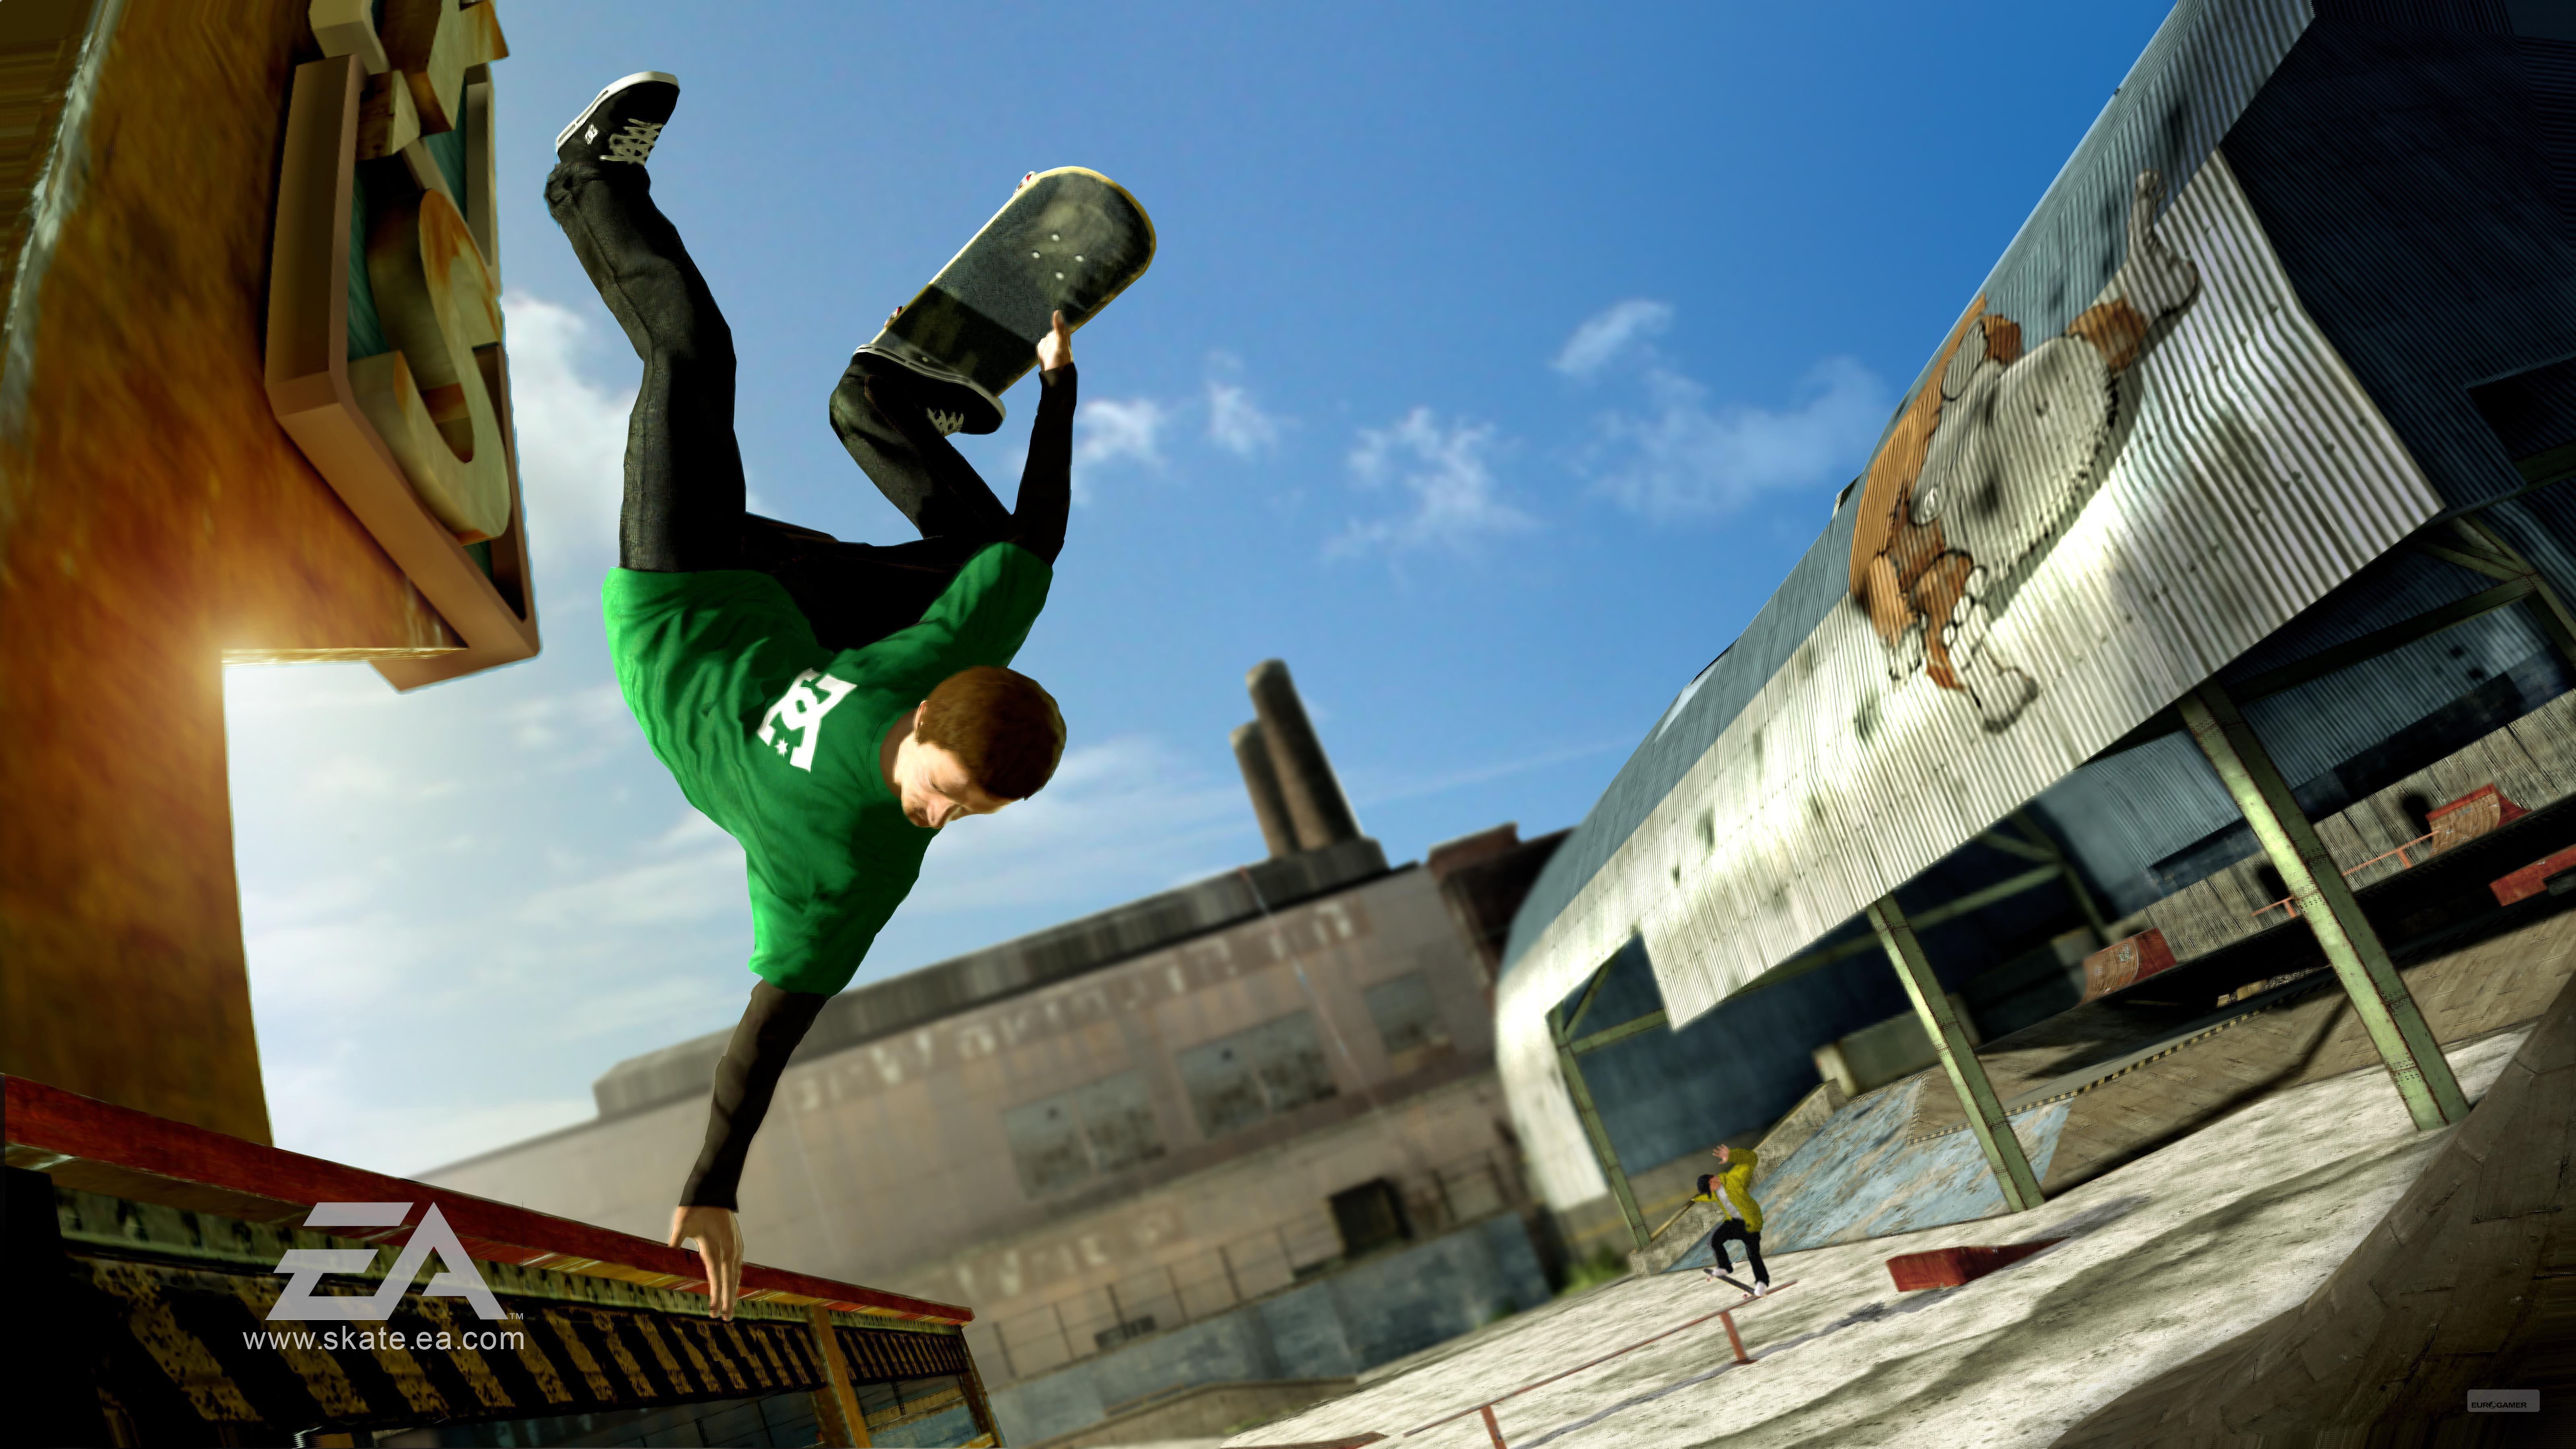 Fonds dcran Skate tous les wallpapers Skate. ← Skate 3 Wallpaper